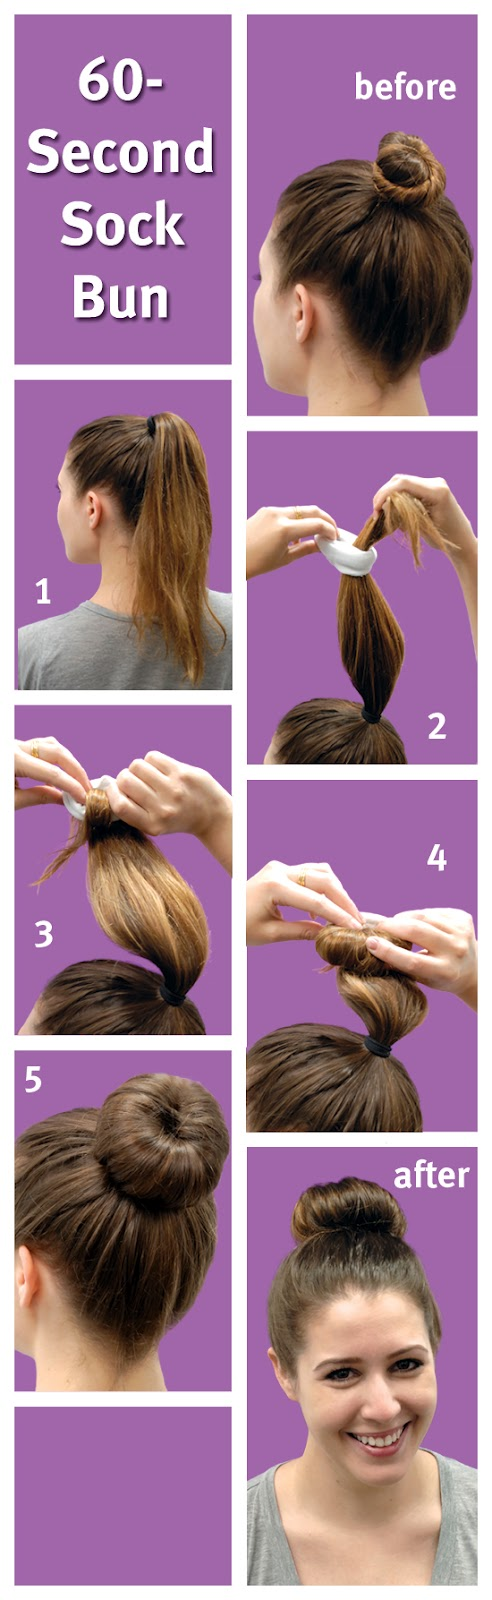 Friday faves | Coiffures coupes de cheveux, Coiffure facile, Idée chignon